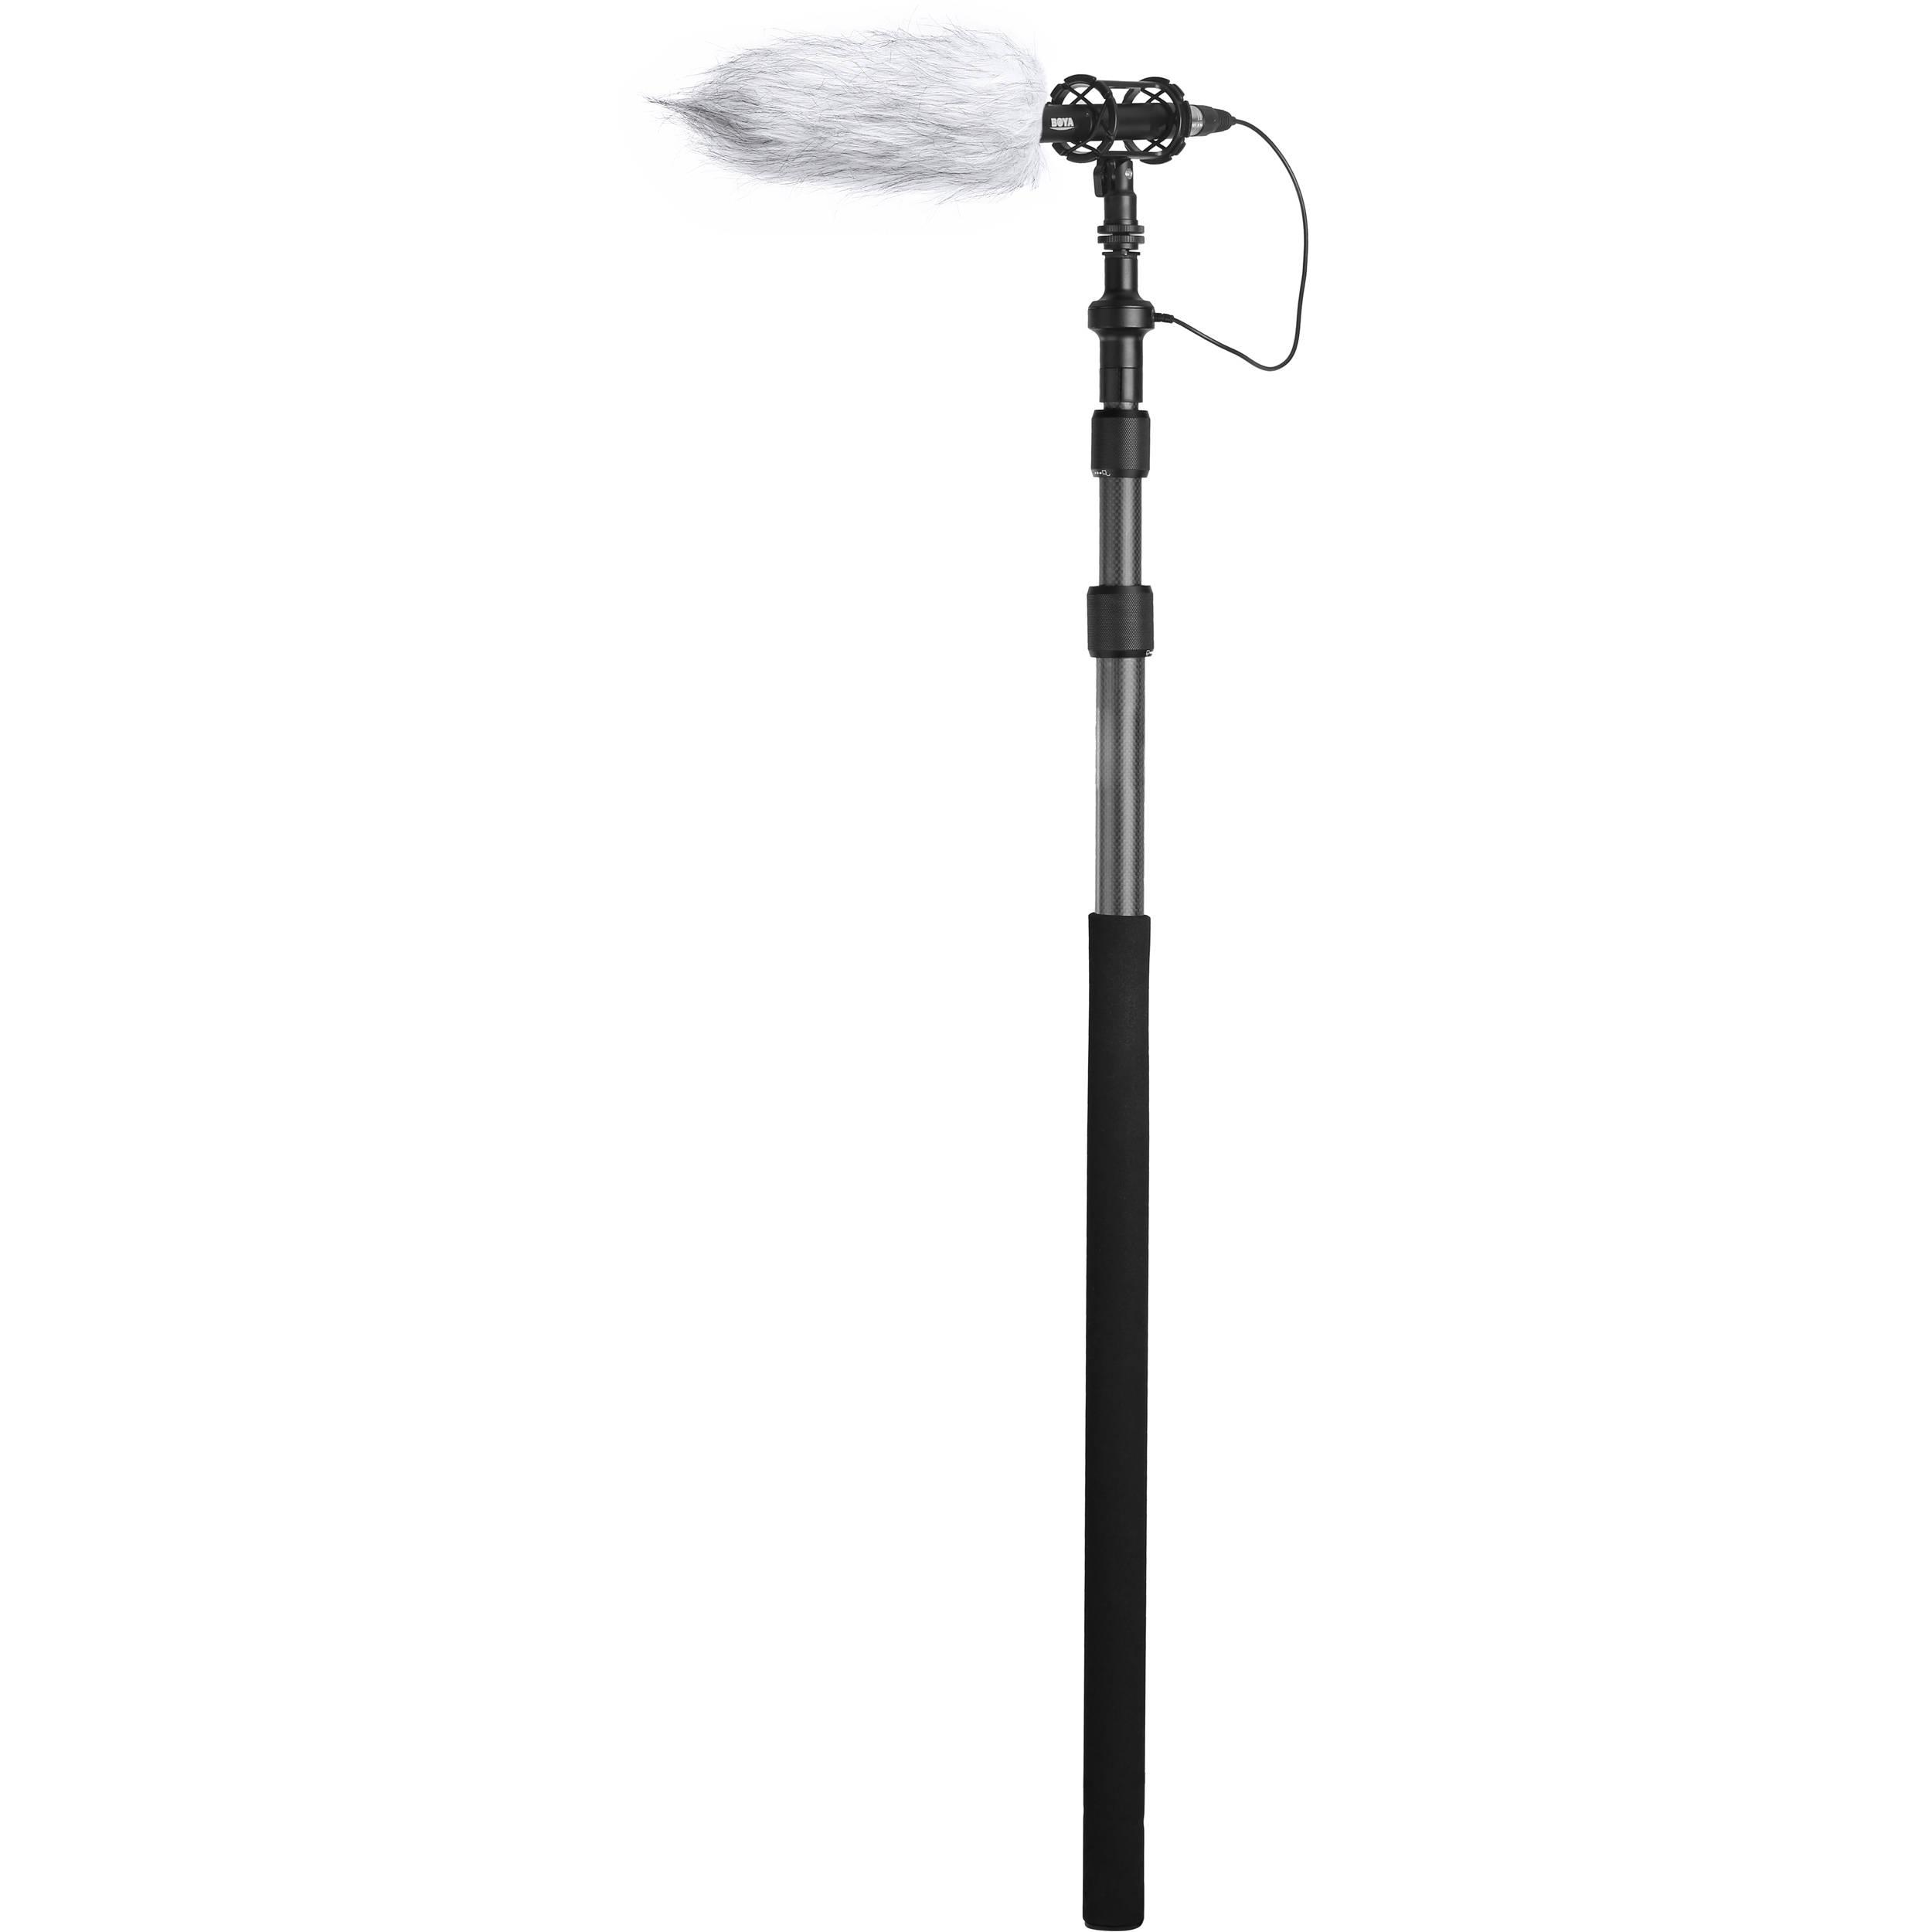 Boya By Pb25 Universal Carbon Fiber Boompole By Pb25 B H Photo